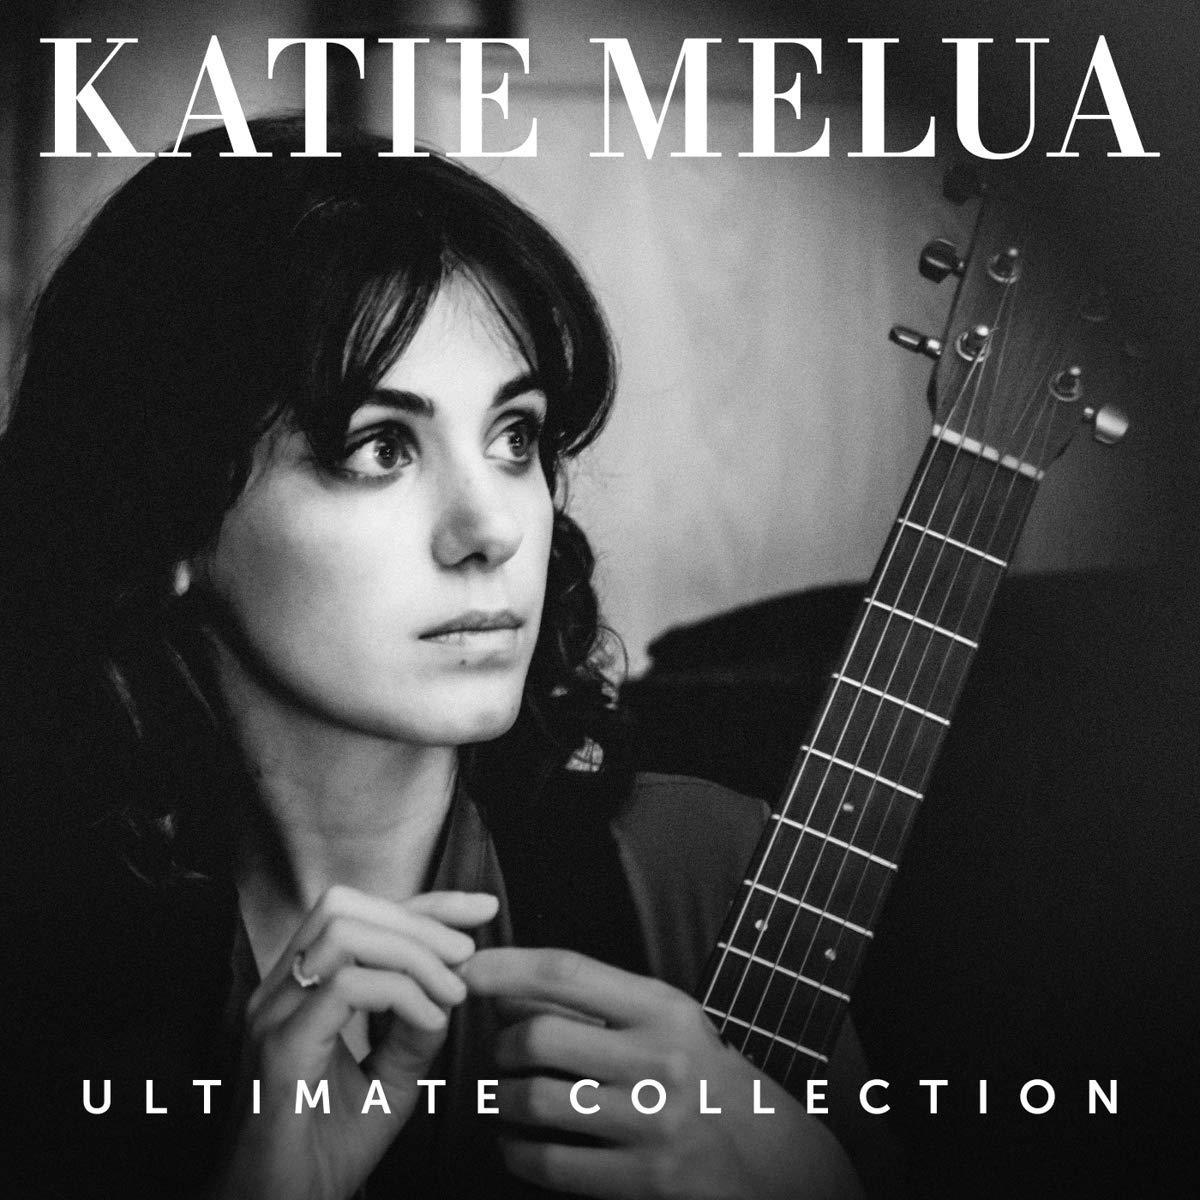 Katie Melua - Ultimate Collection [LTD 2xLP]